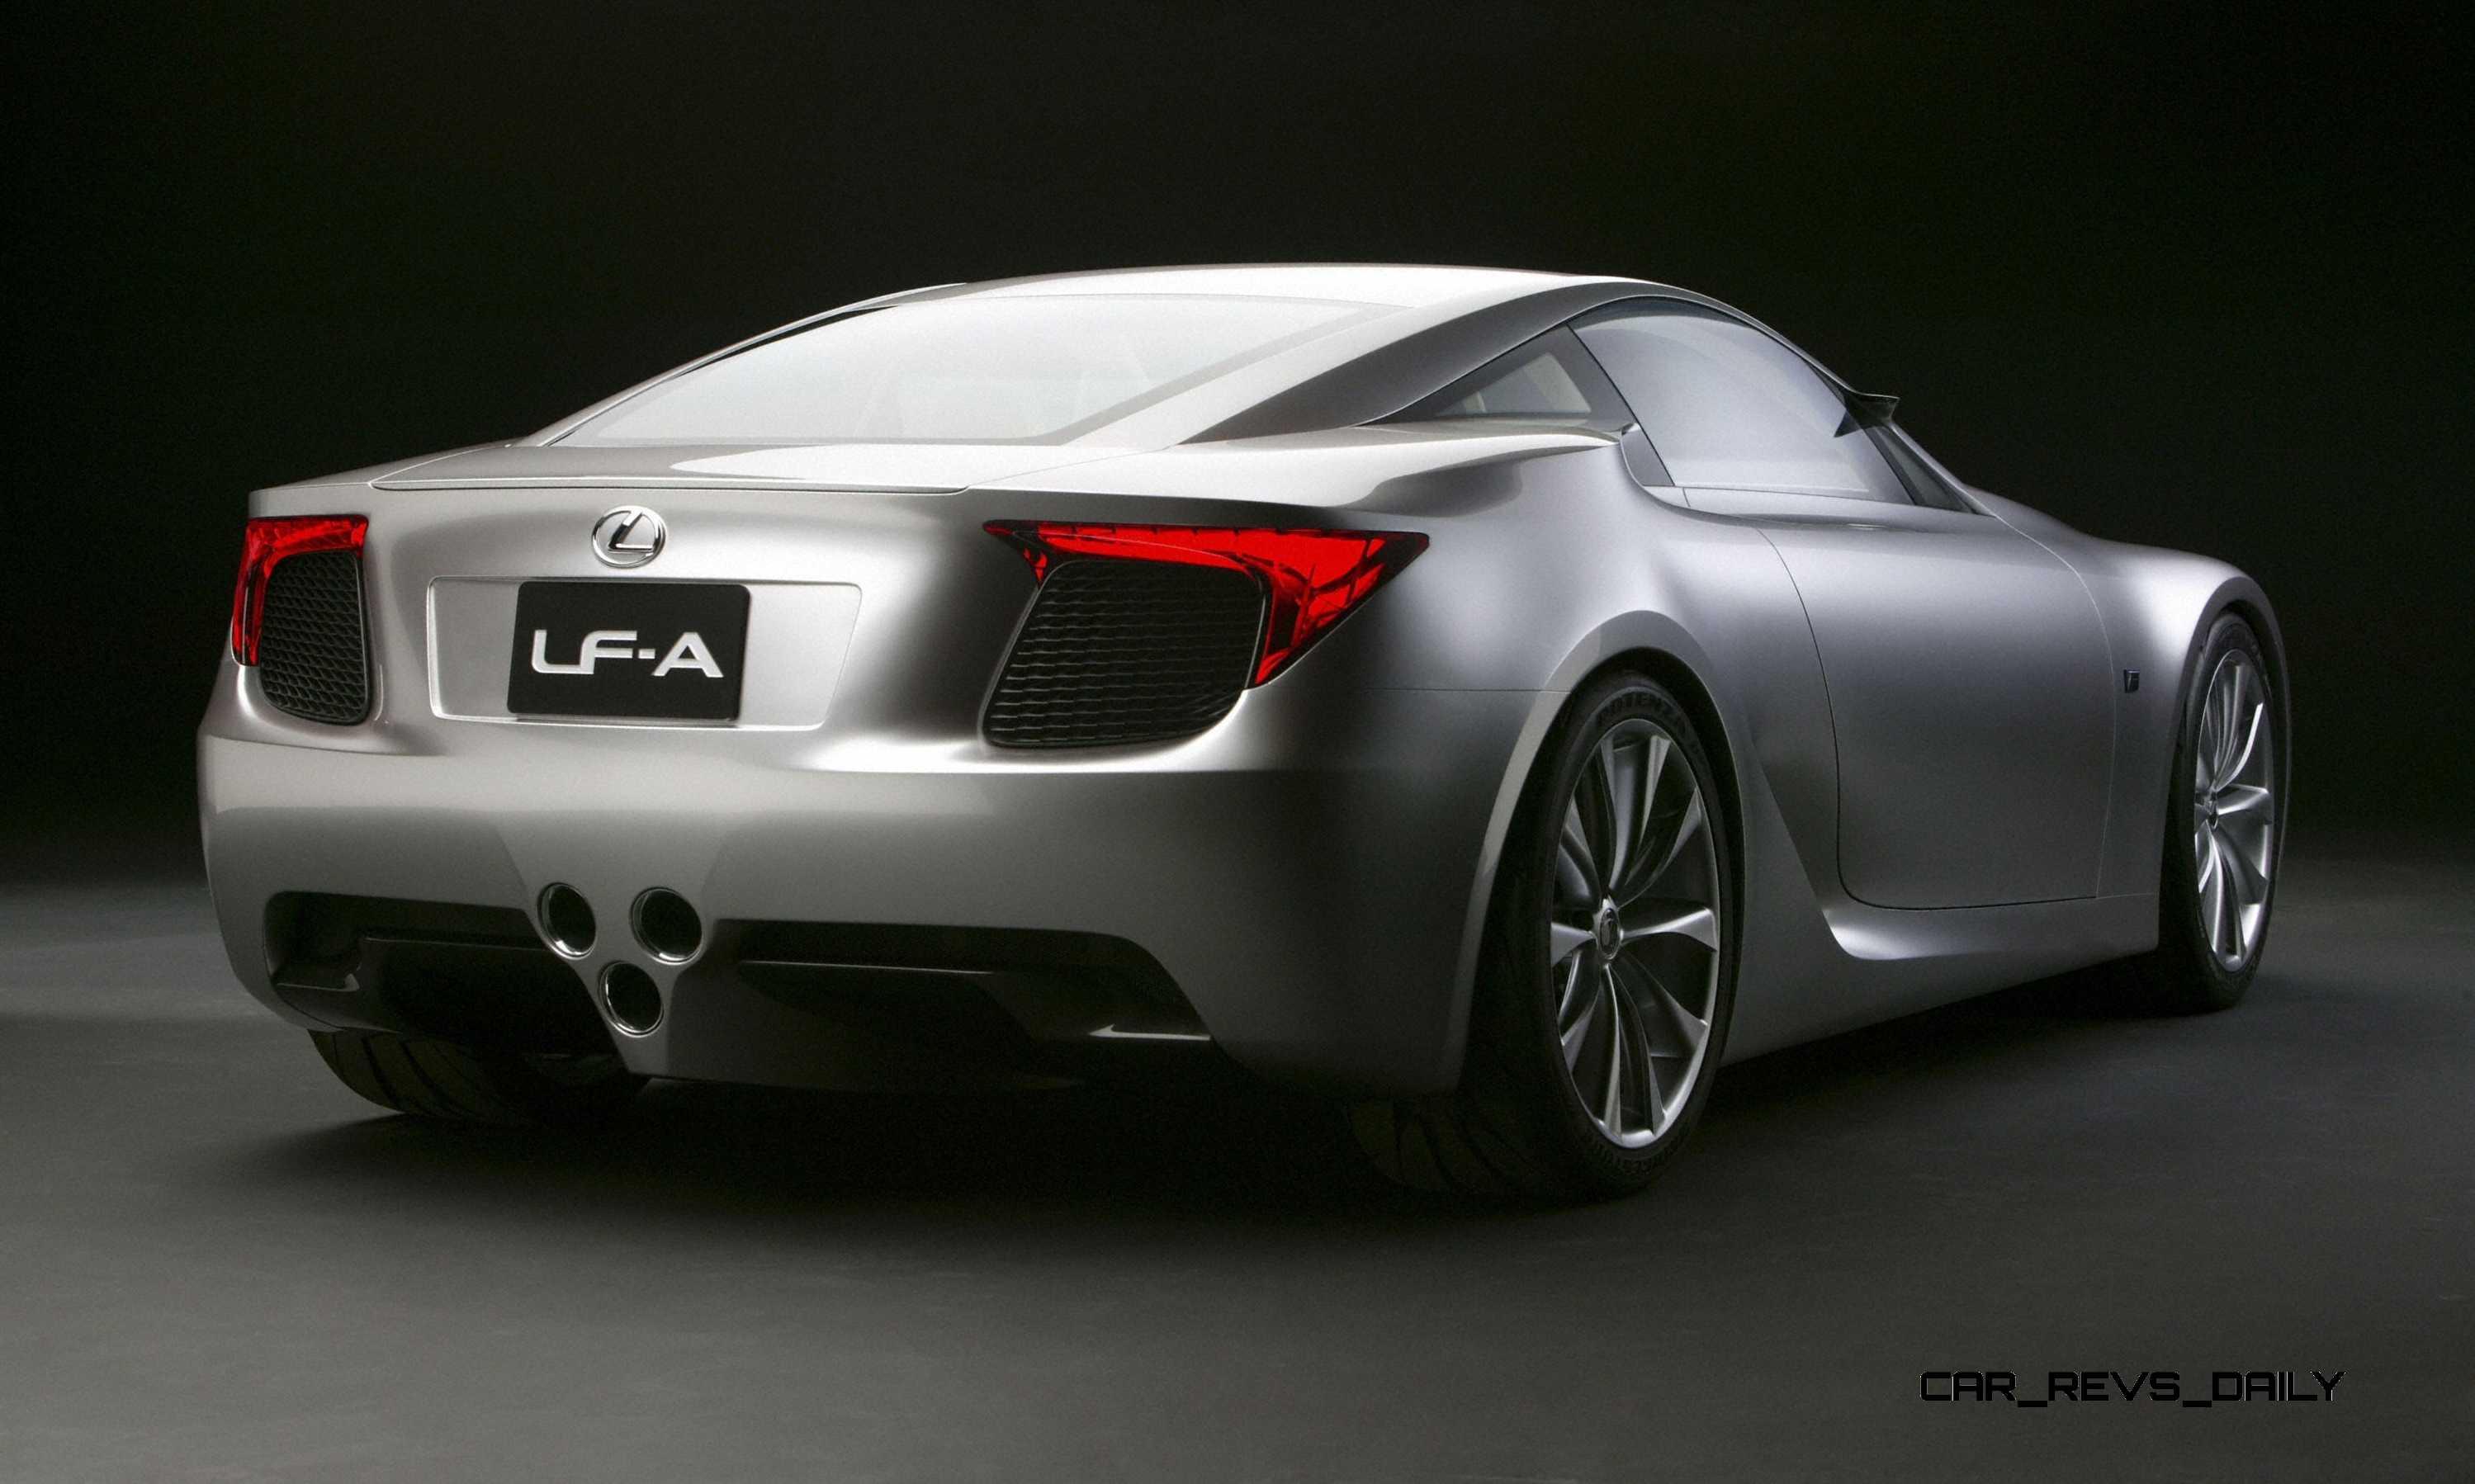 http://www.car-revs-daily.com/wp-content/uploads/2014/10/2005-Lexus-LFA-Coupe-8.jpg